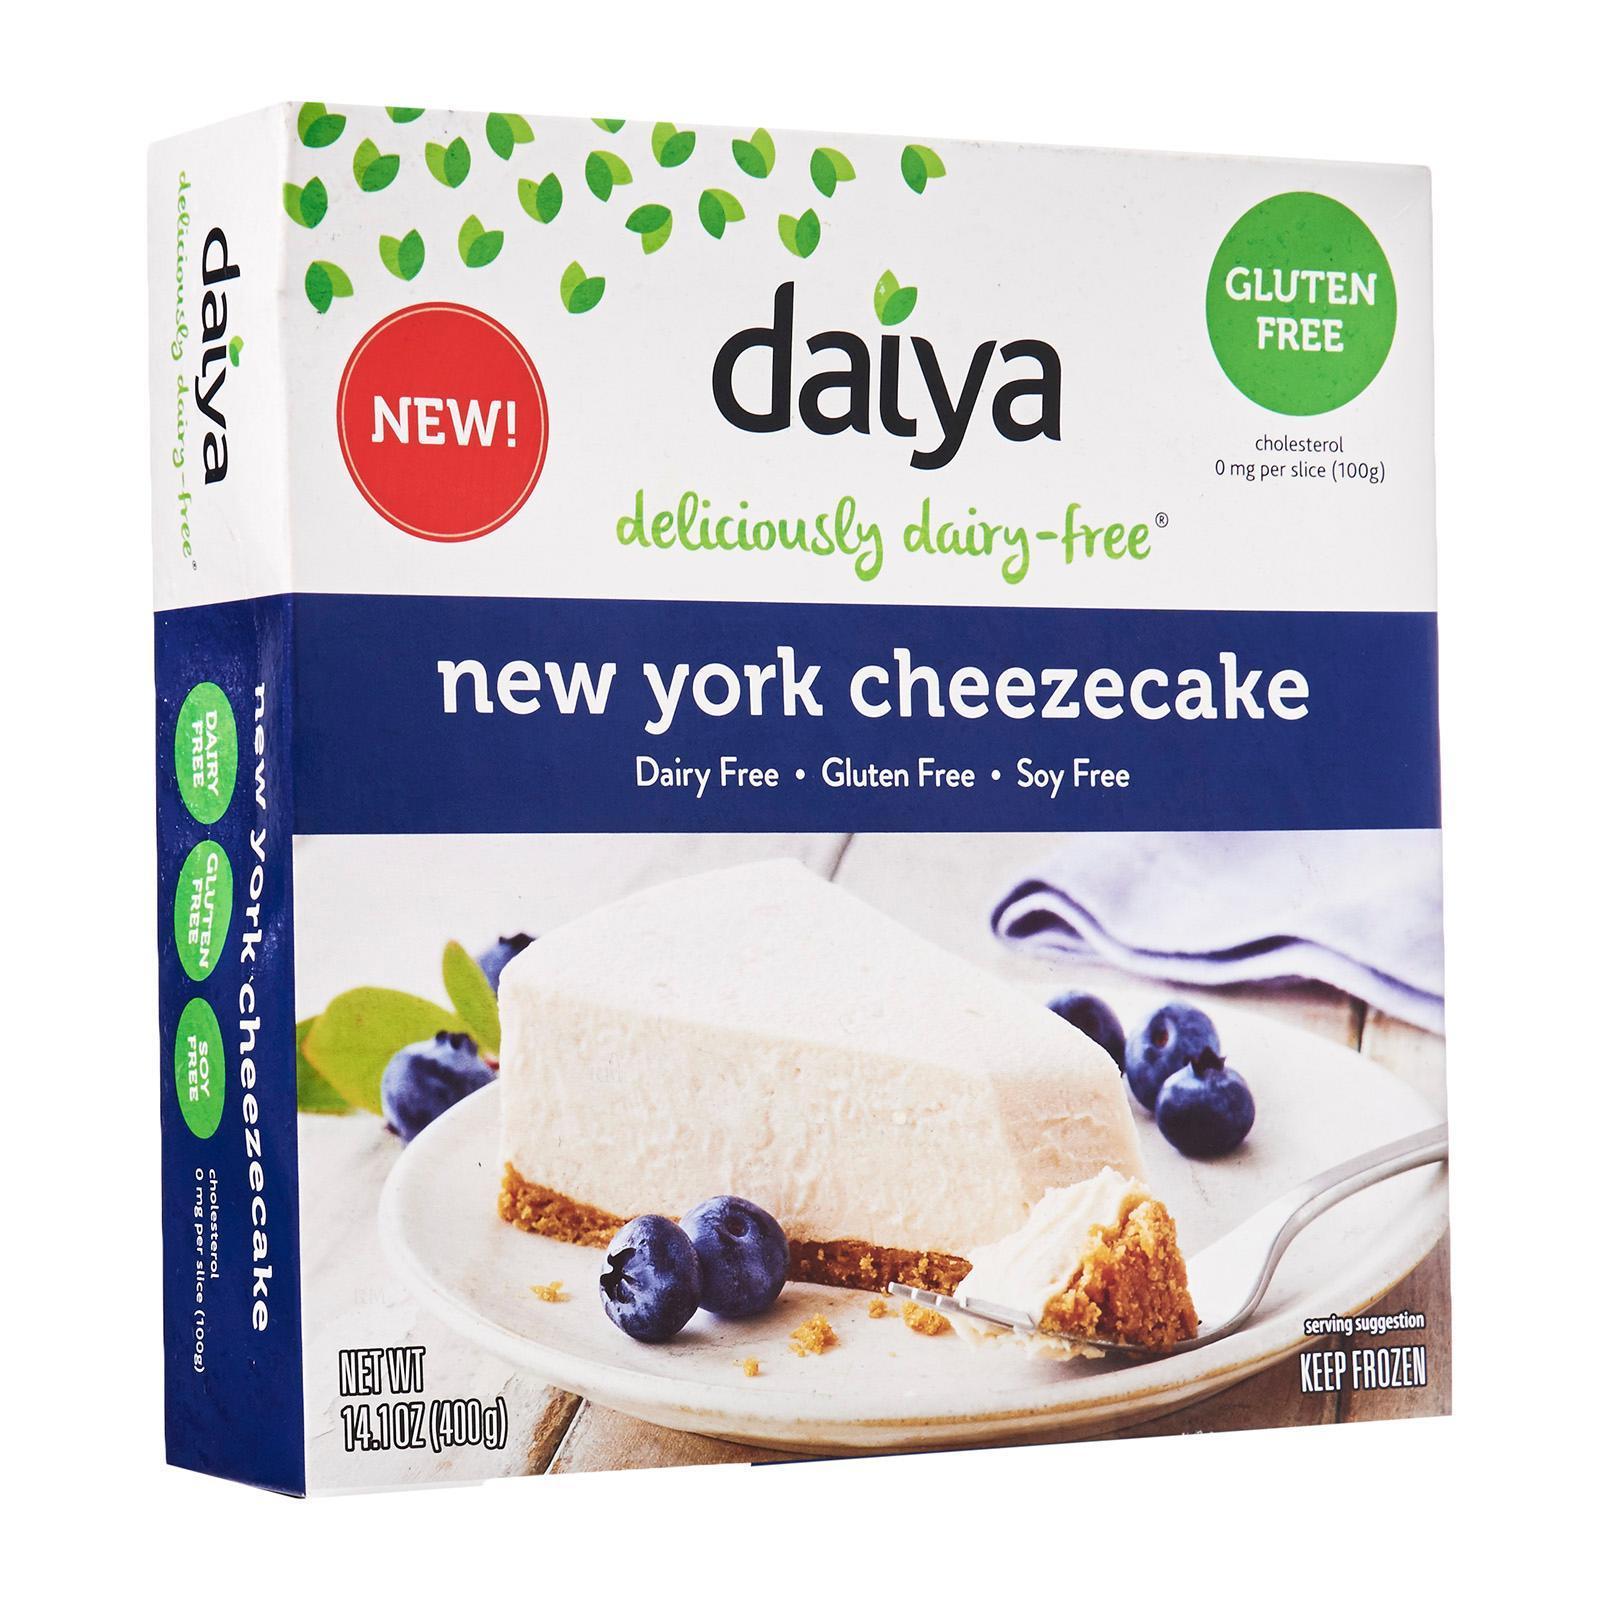 Daiya New York Cheezecake Gluten Free Dairy Free - Frozen